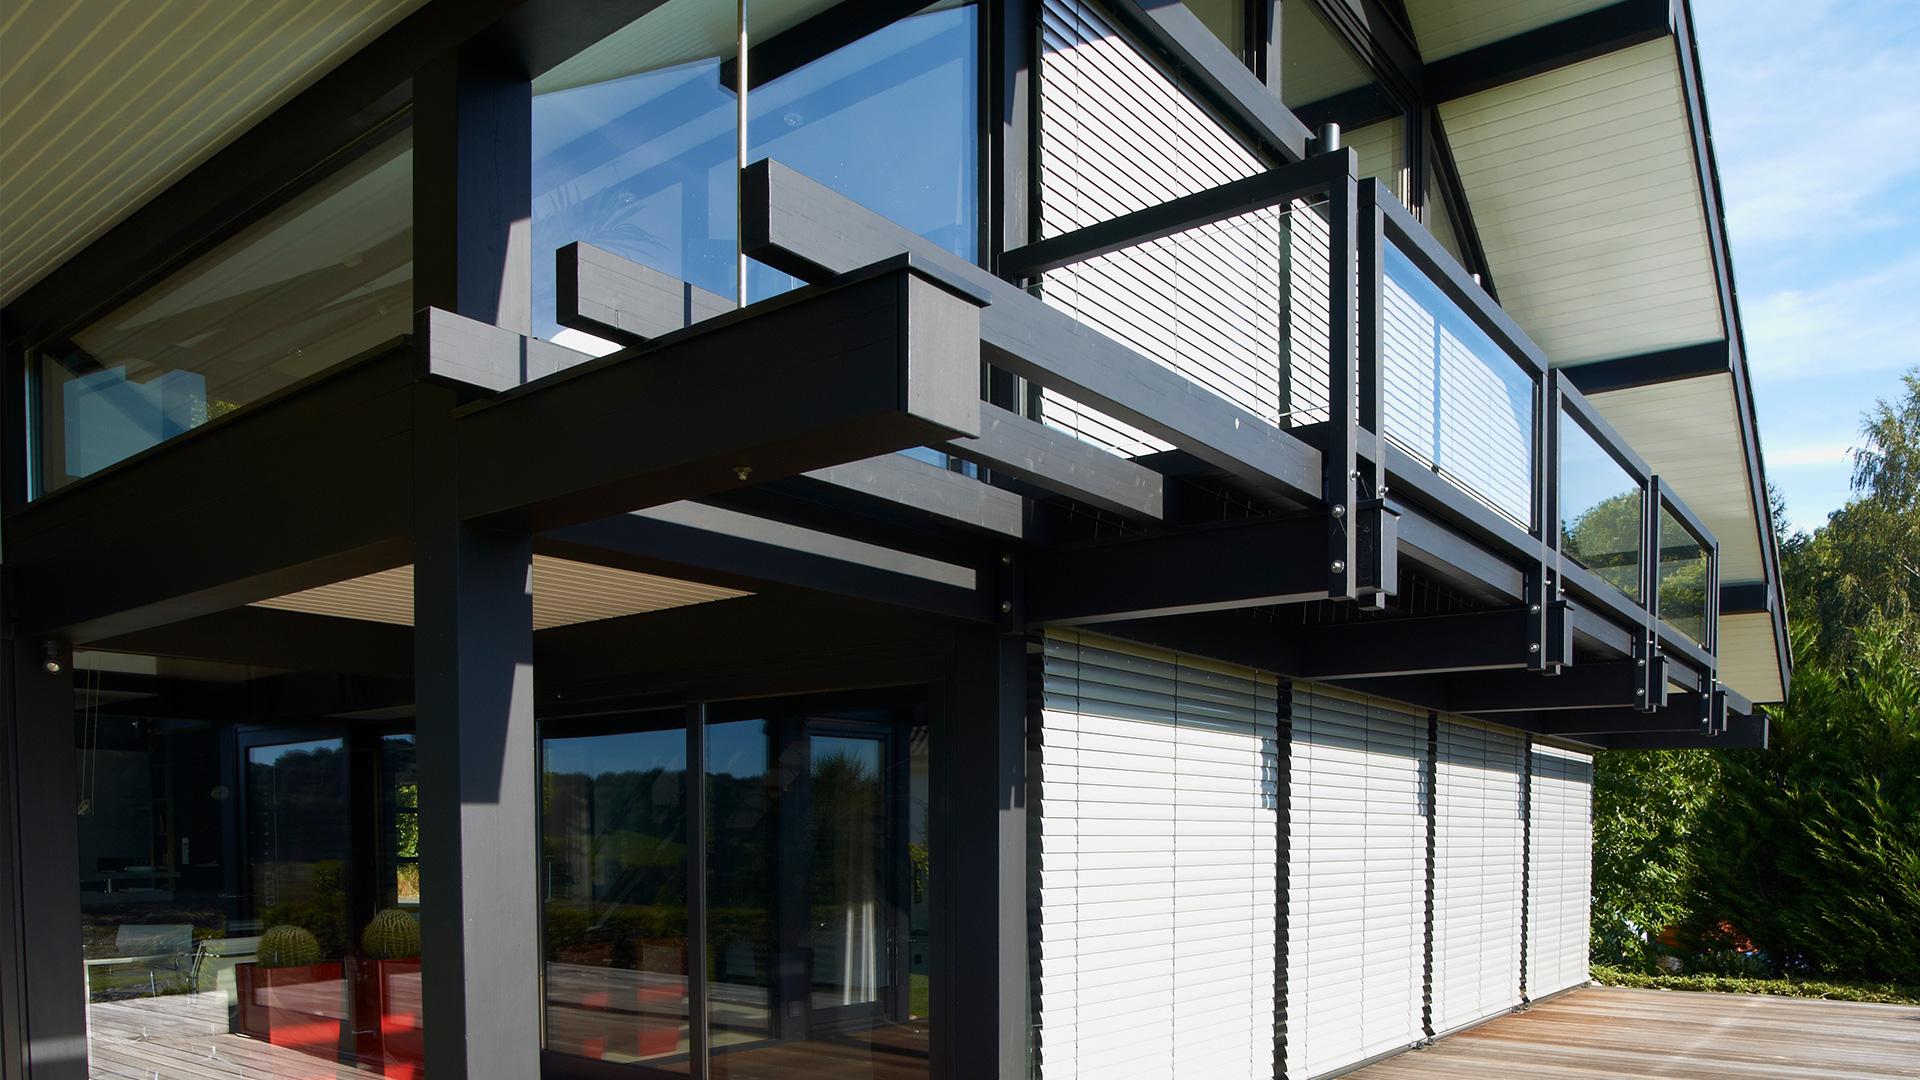 Modernes Fachwerkhaus | Musterhaus | Detmolder Fachwerkaus